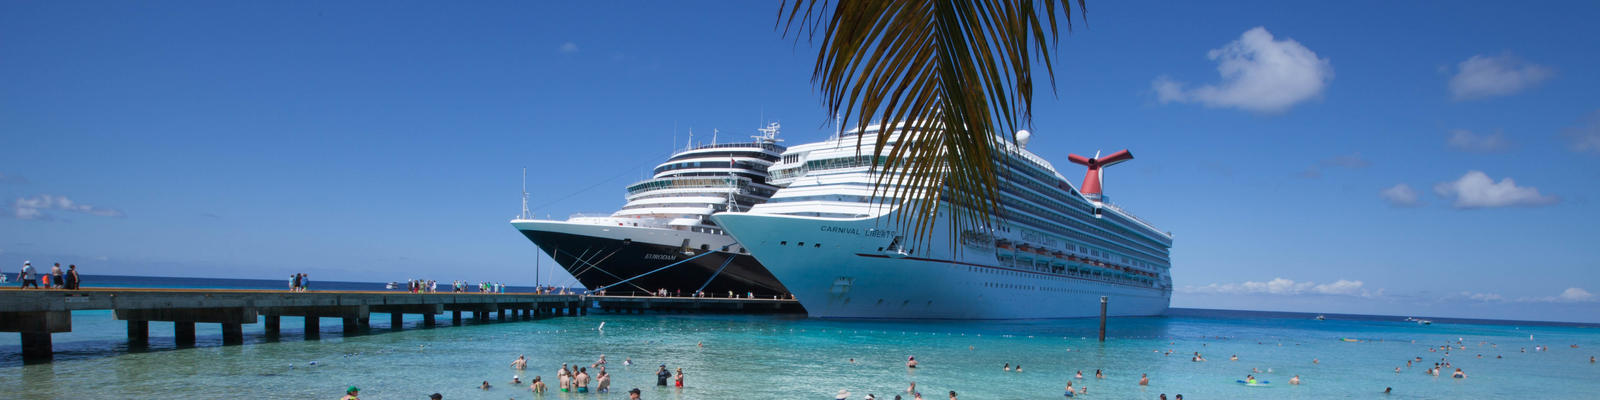 Cruise ships in Grand Turk (Photo: Cruise Critic)